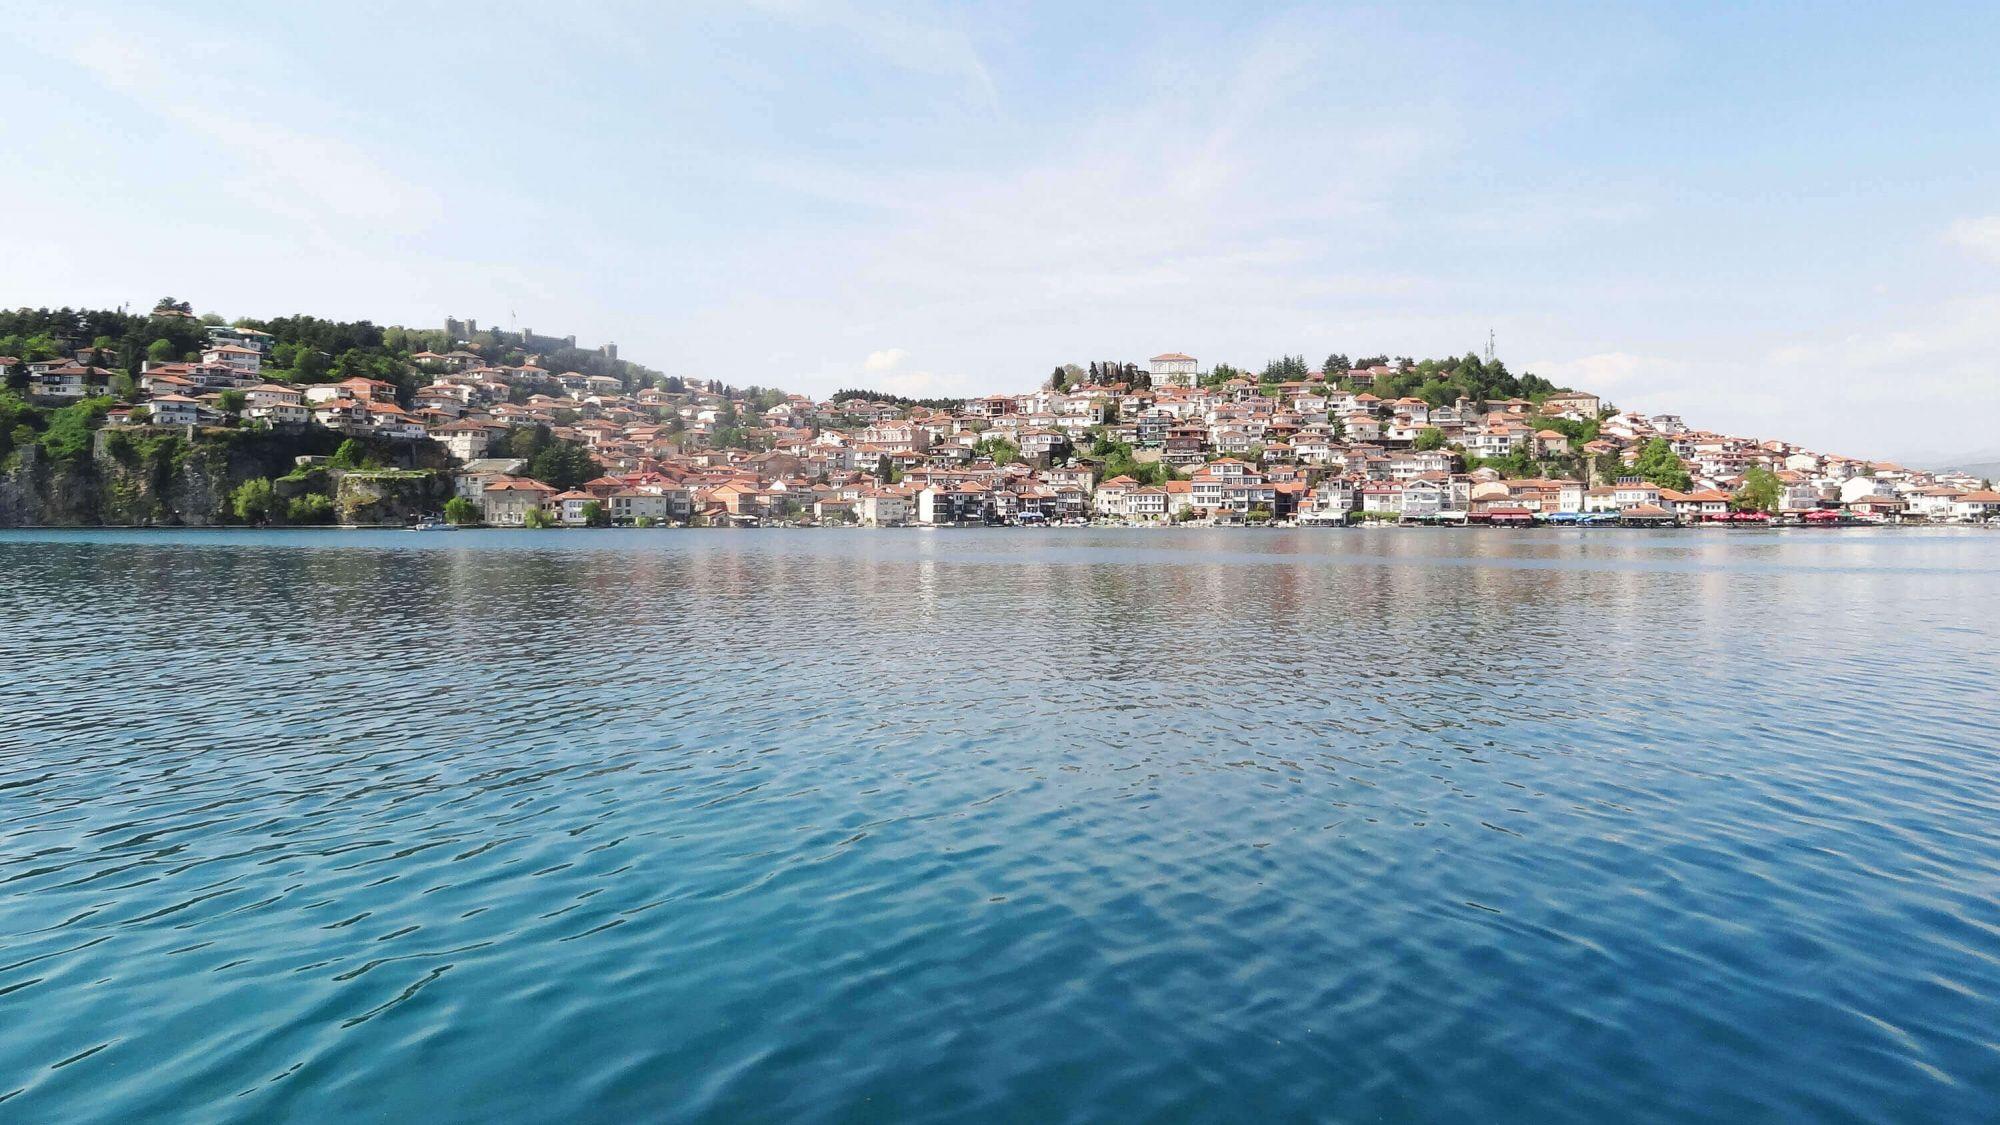 Ohri Gezi Rehberi Makedonya | Ohri Gezi Rehberi Makedonya Ohri Tekne Turu 6